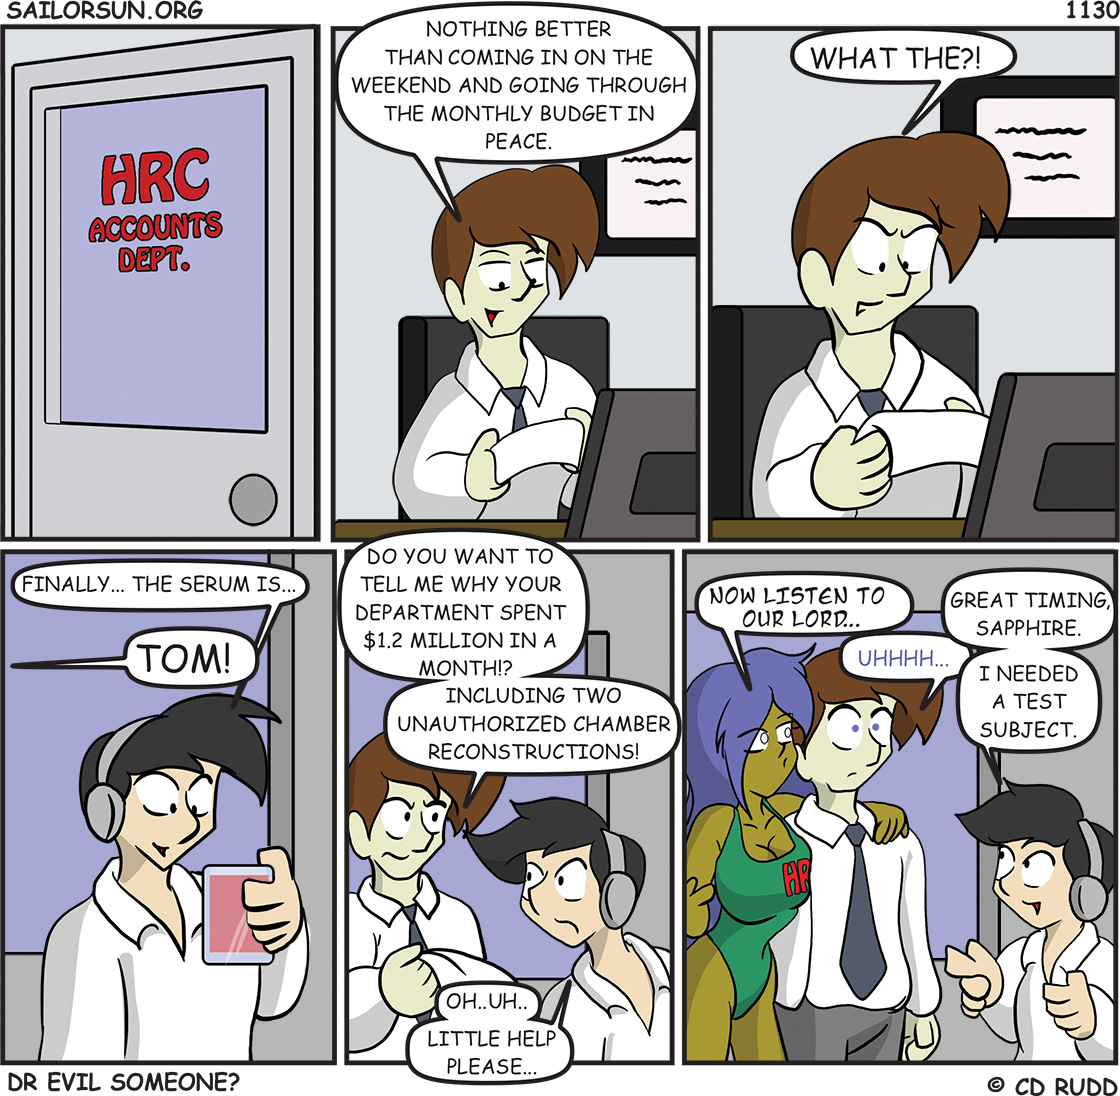 1130 : Dr. Evil Someone?